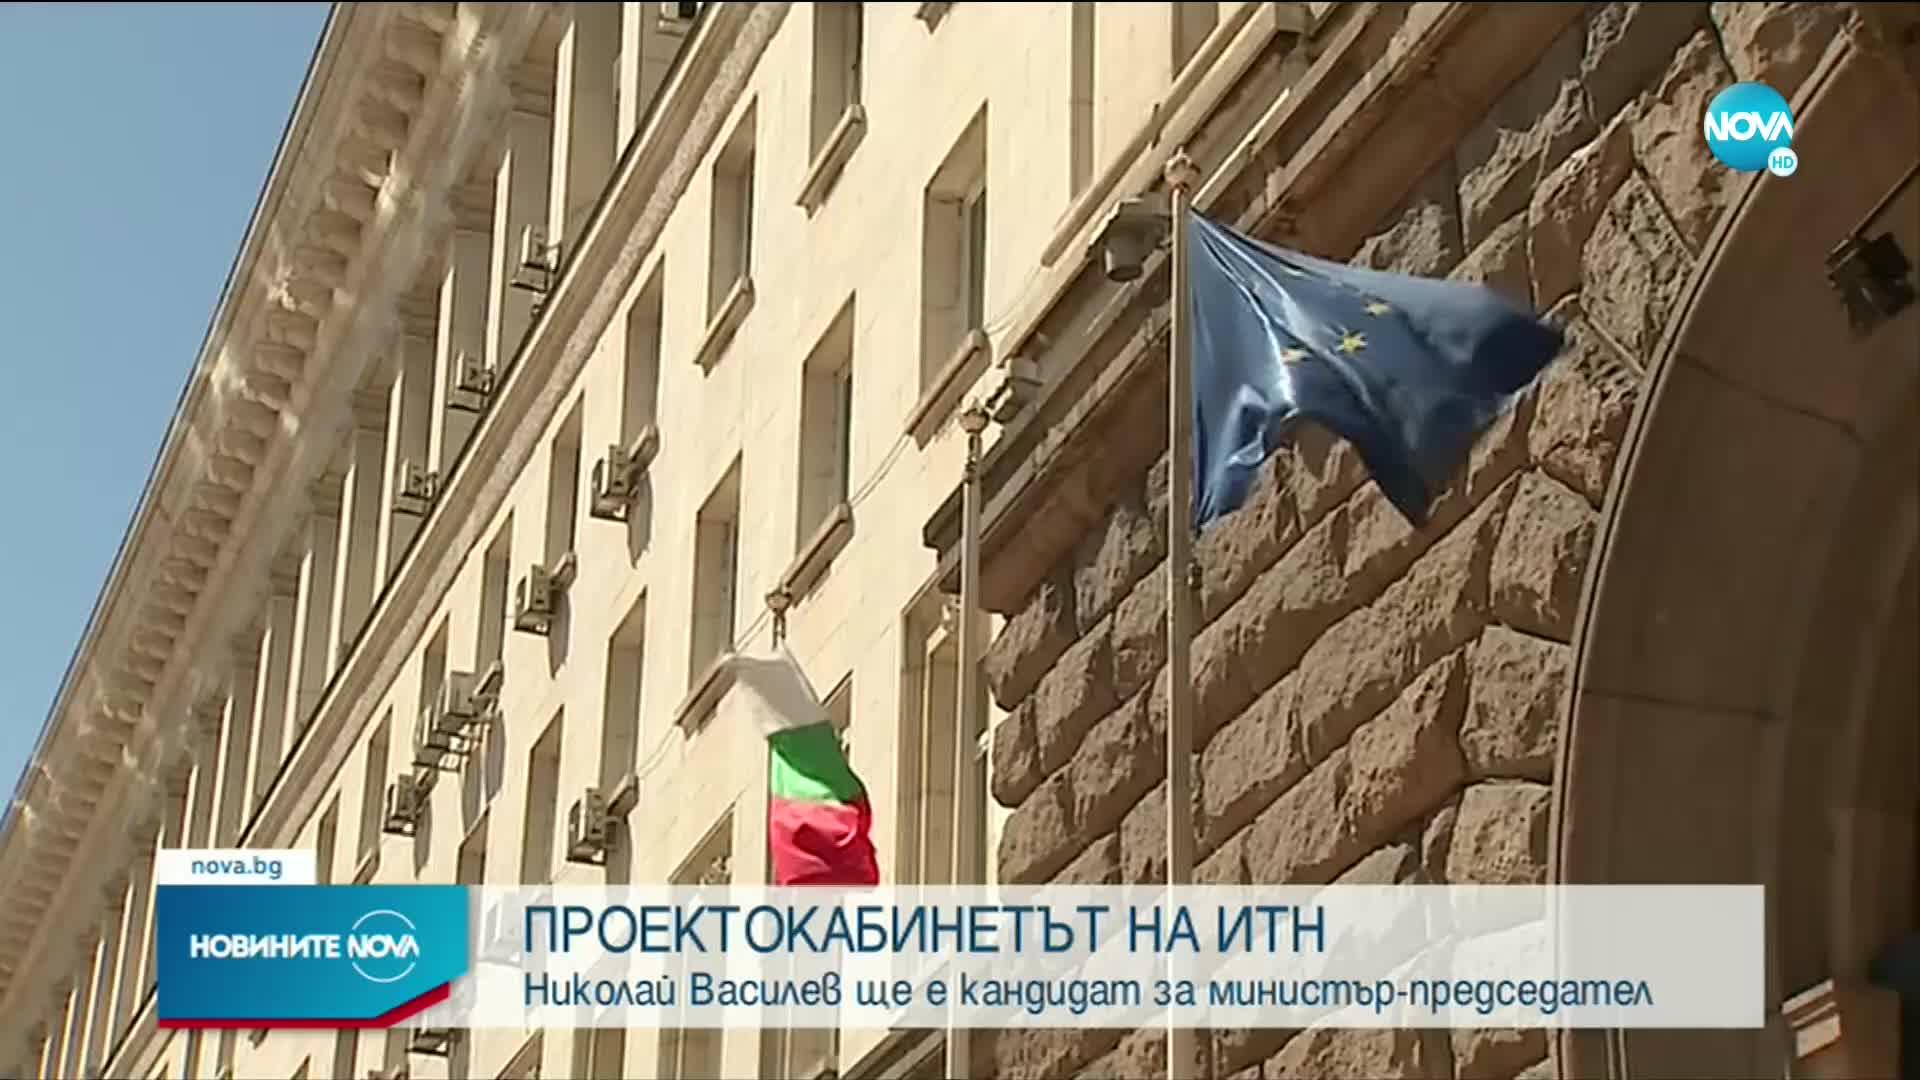 Слави Трифонов представи проектокабинета на ИТН